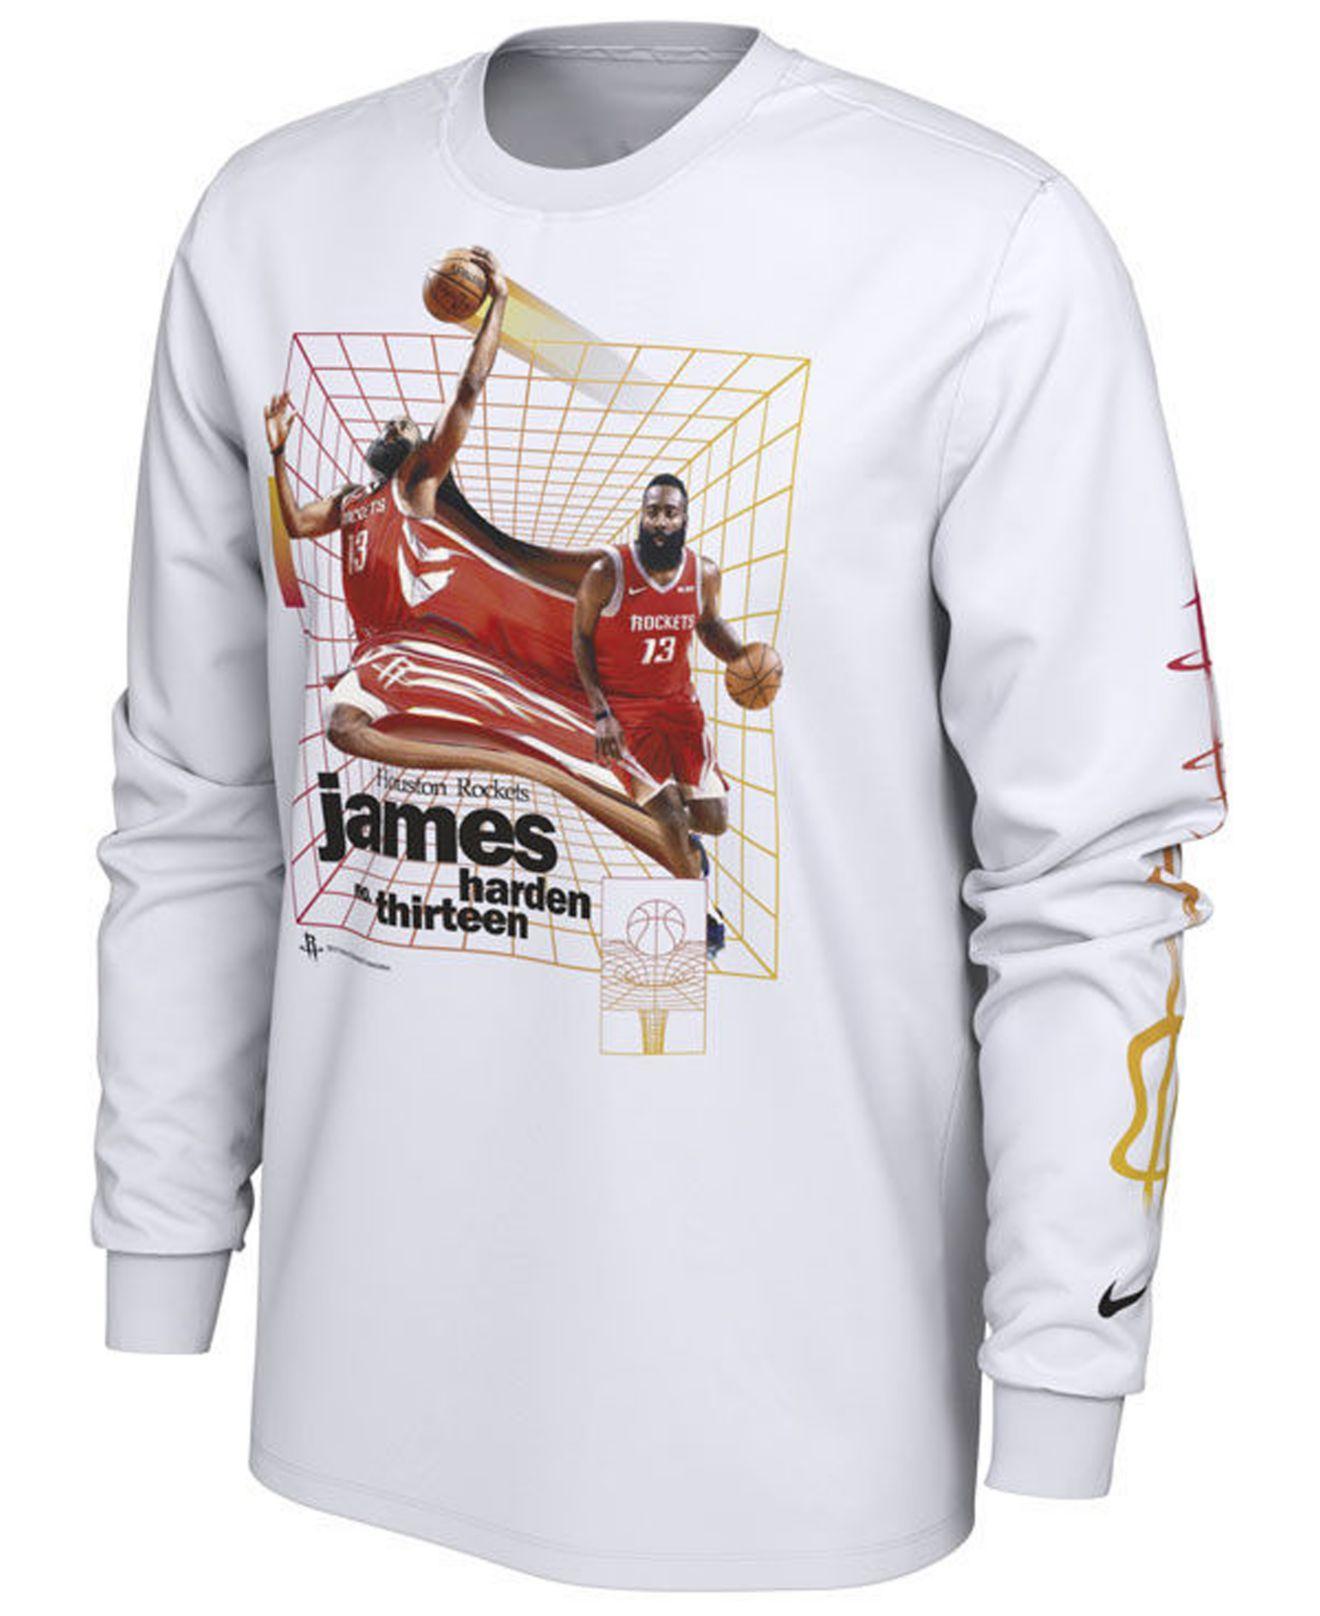 3e4aa87df5a Nike. Men s White James Harden Houston Rockets Time Warp Player Photo Long  Sleeve T-shirt